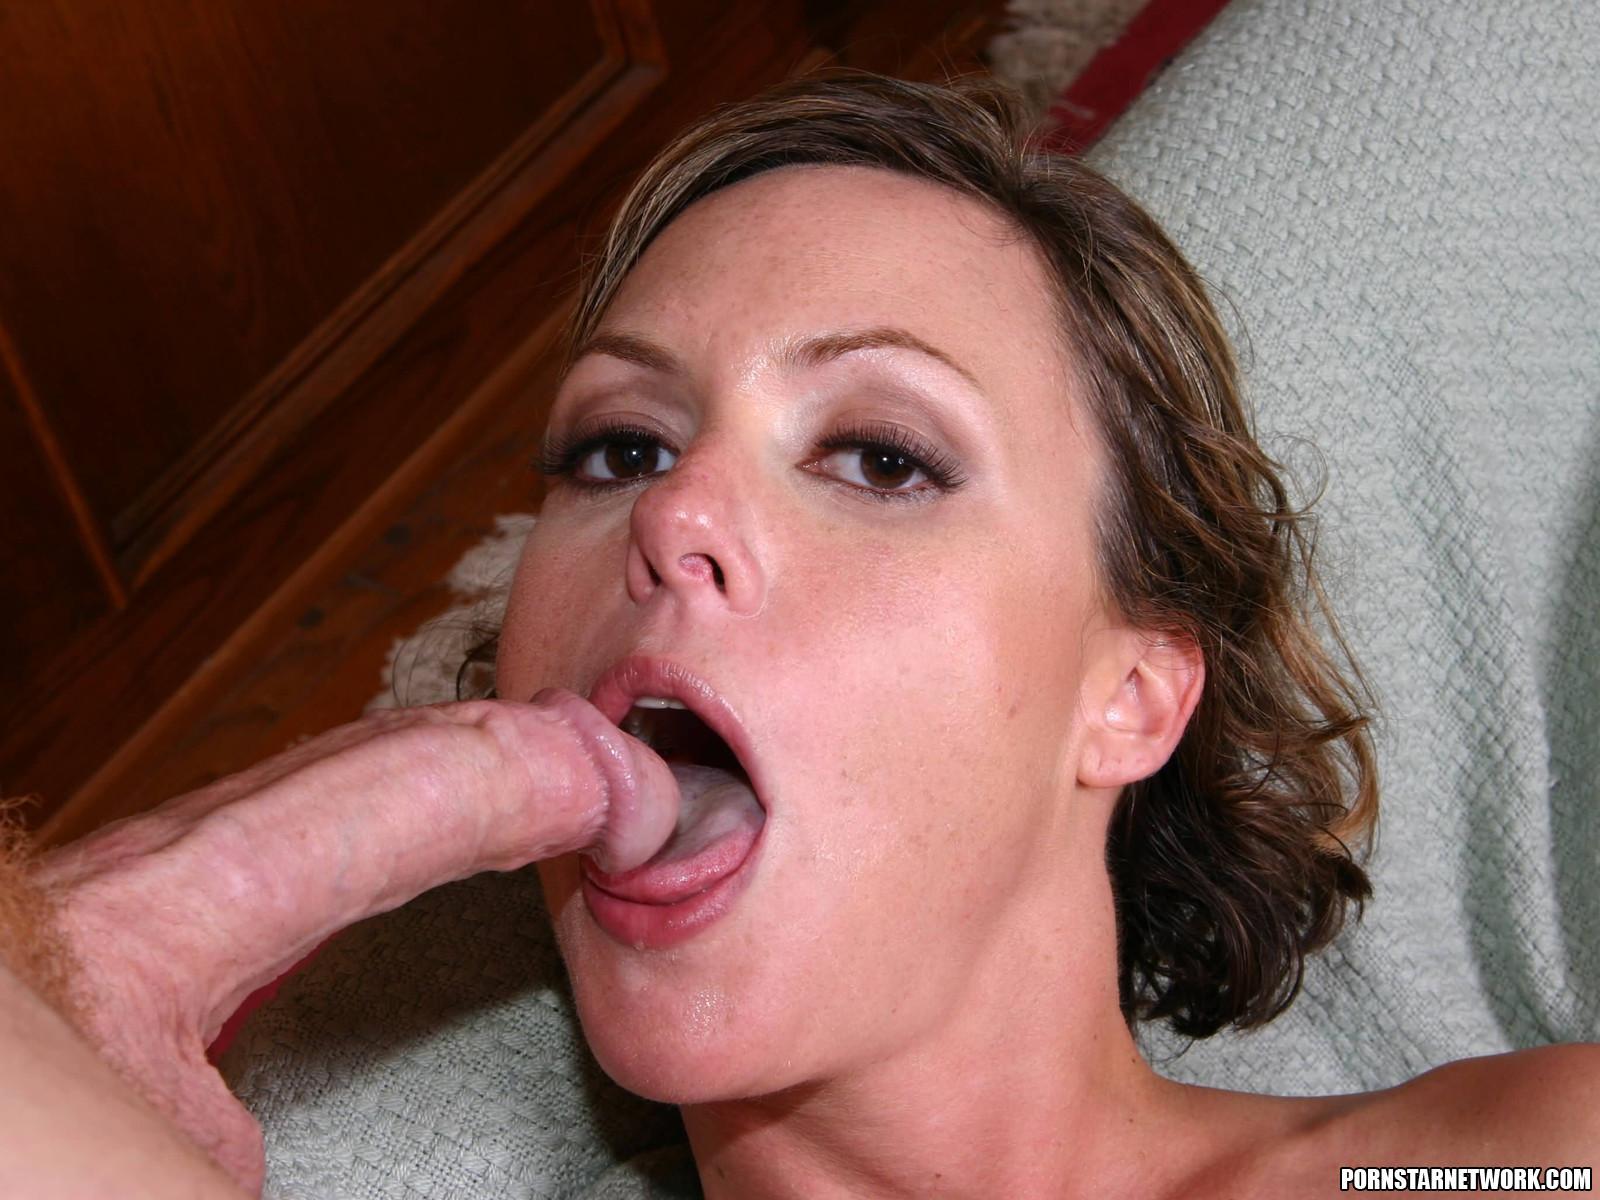 Stylish milf teacher saskia got her beautiful pussy pounded hardcore